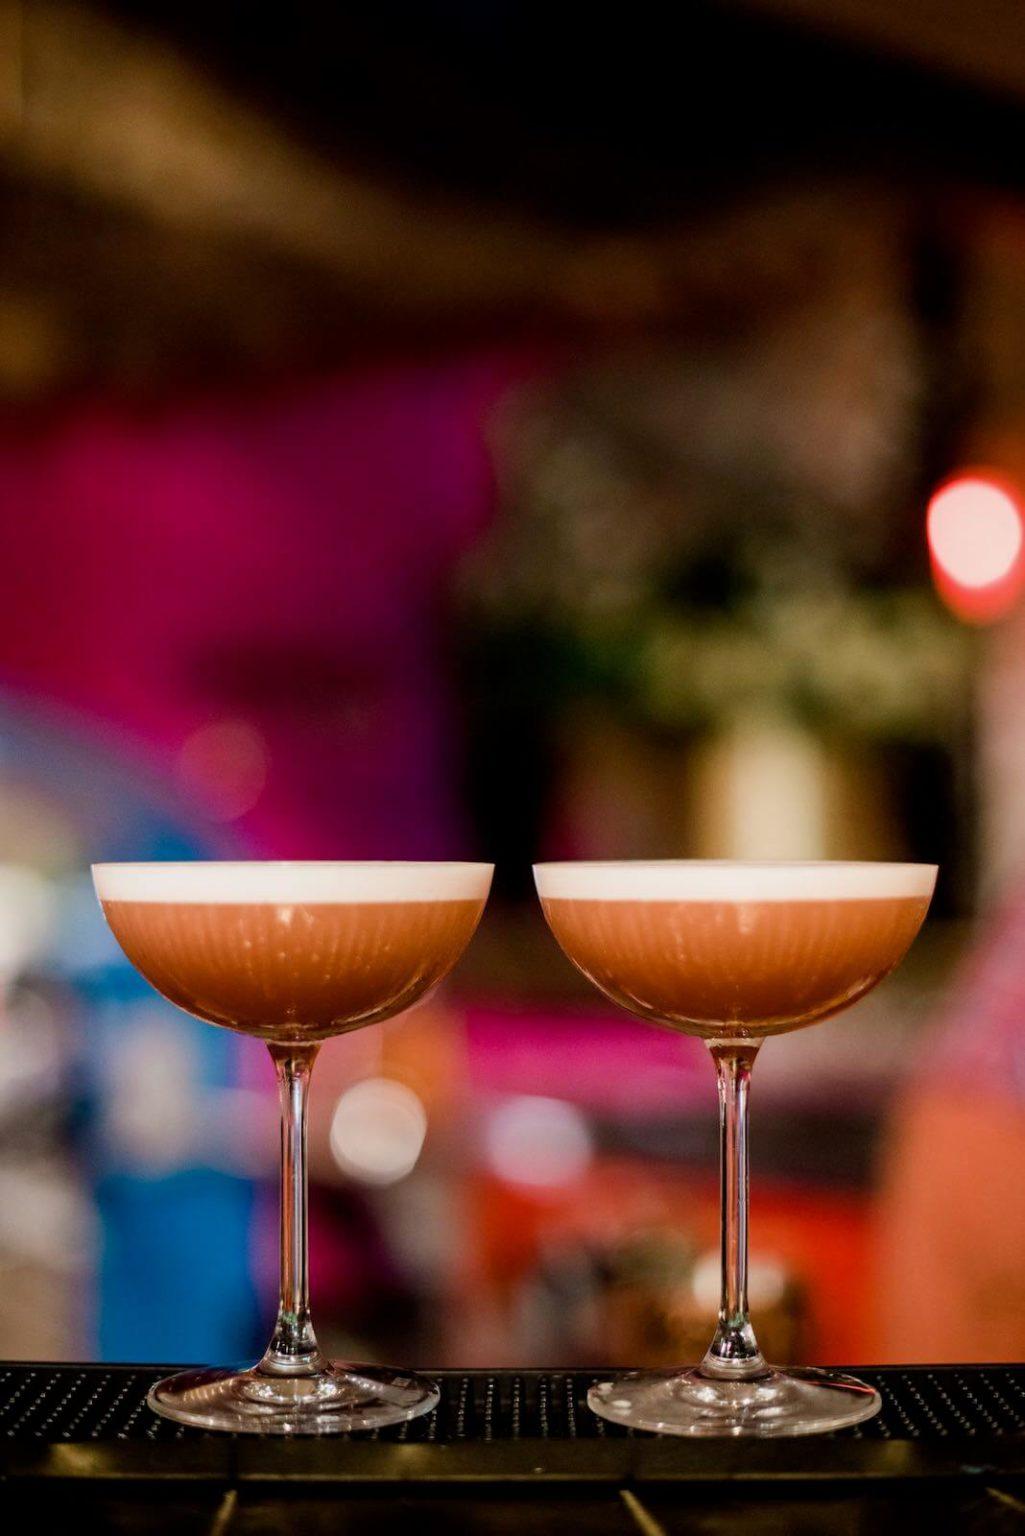 https://www.white-ibiza.com/wp-content/uploads/2020/03/ibiza-restaurant-pamelas-at-pikes-ibiza-2020-14-1025x1536.jpeg